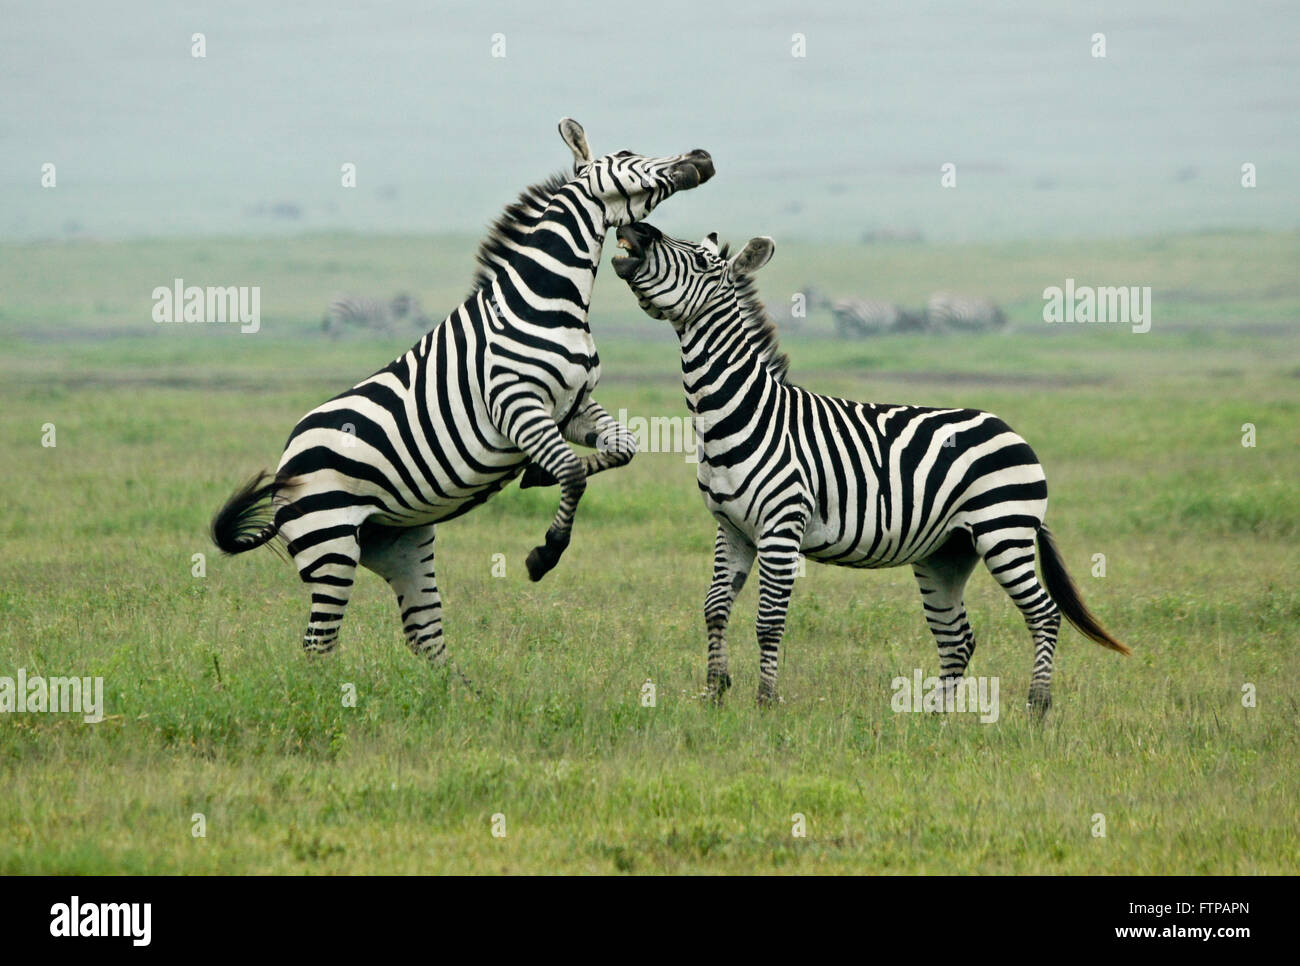 Burchell's (common, plains) zebra stallions fighting, Ngorongoro Crater, Tanzania - Stock Image